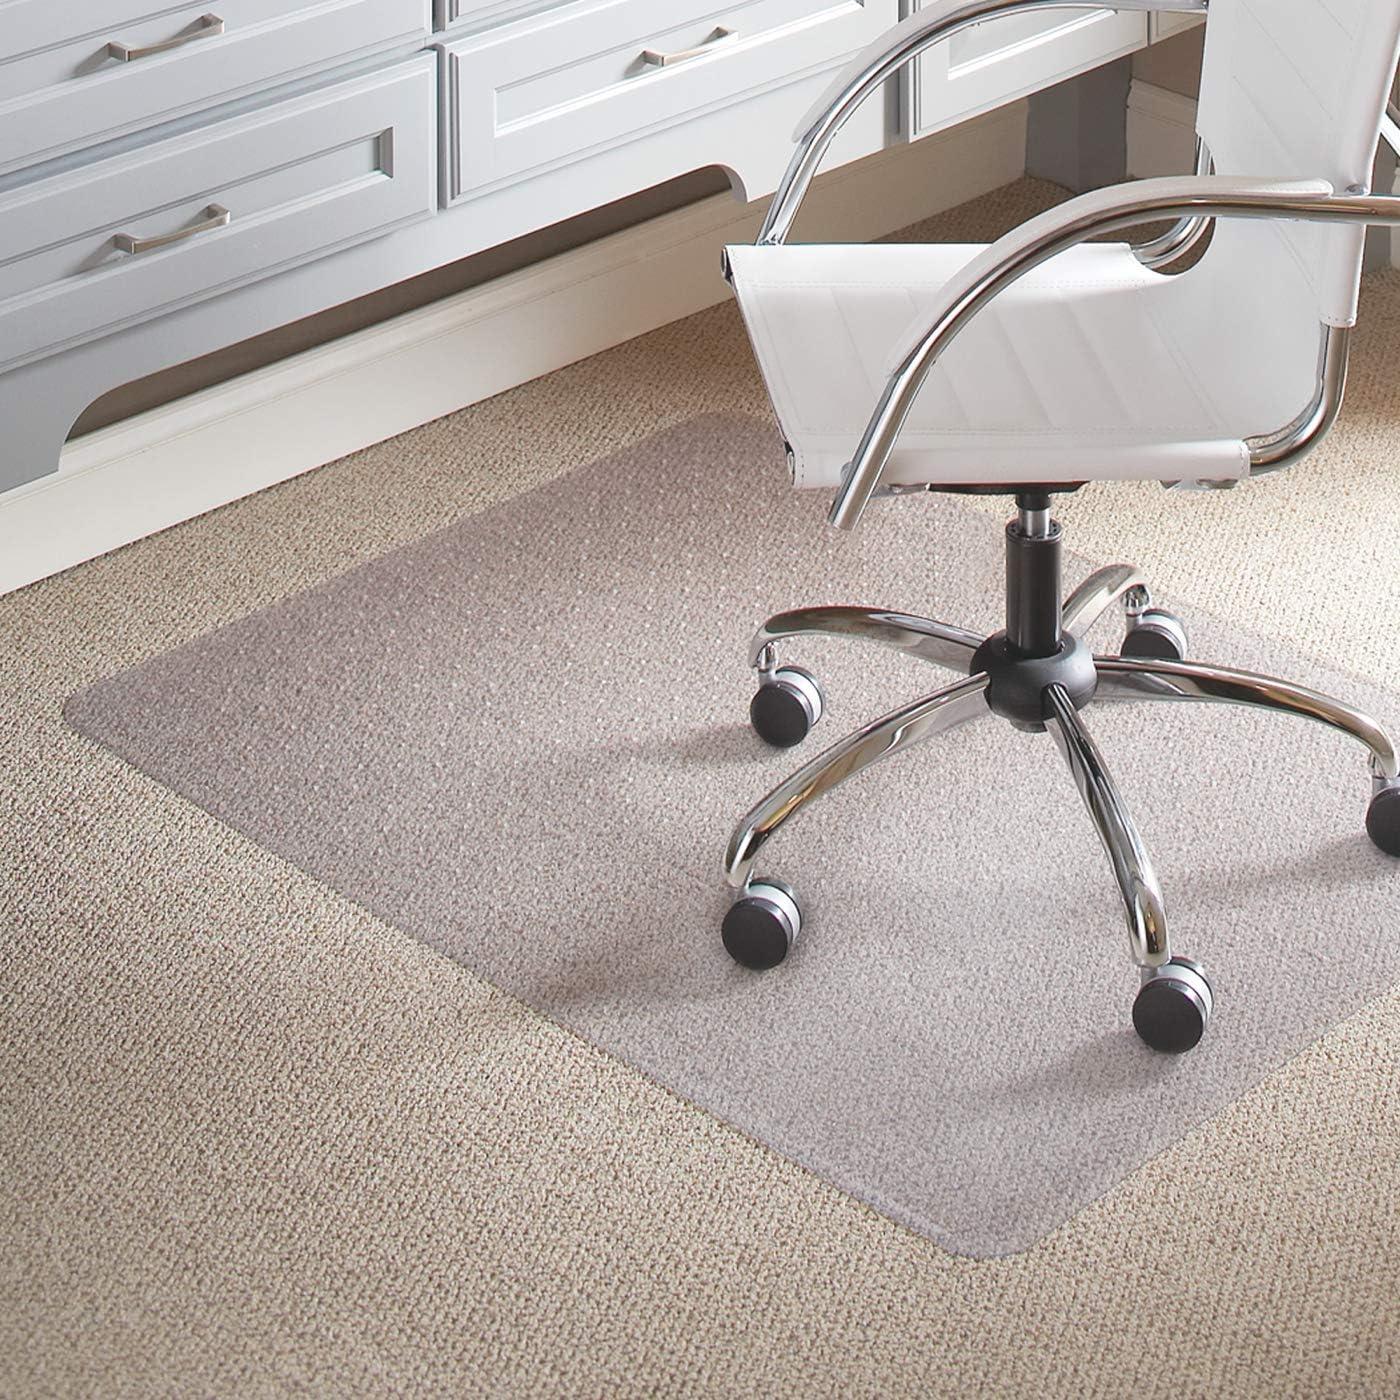 36 x 48 Rectangular Heavy Duty Chair Mat for Hardwood Floor